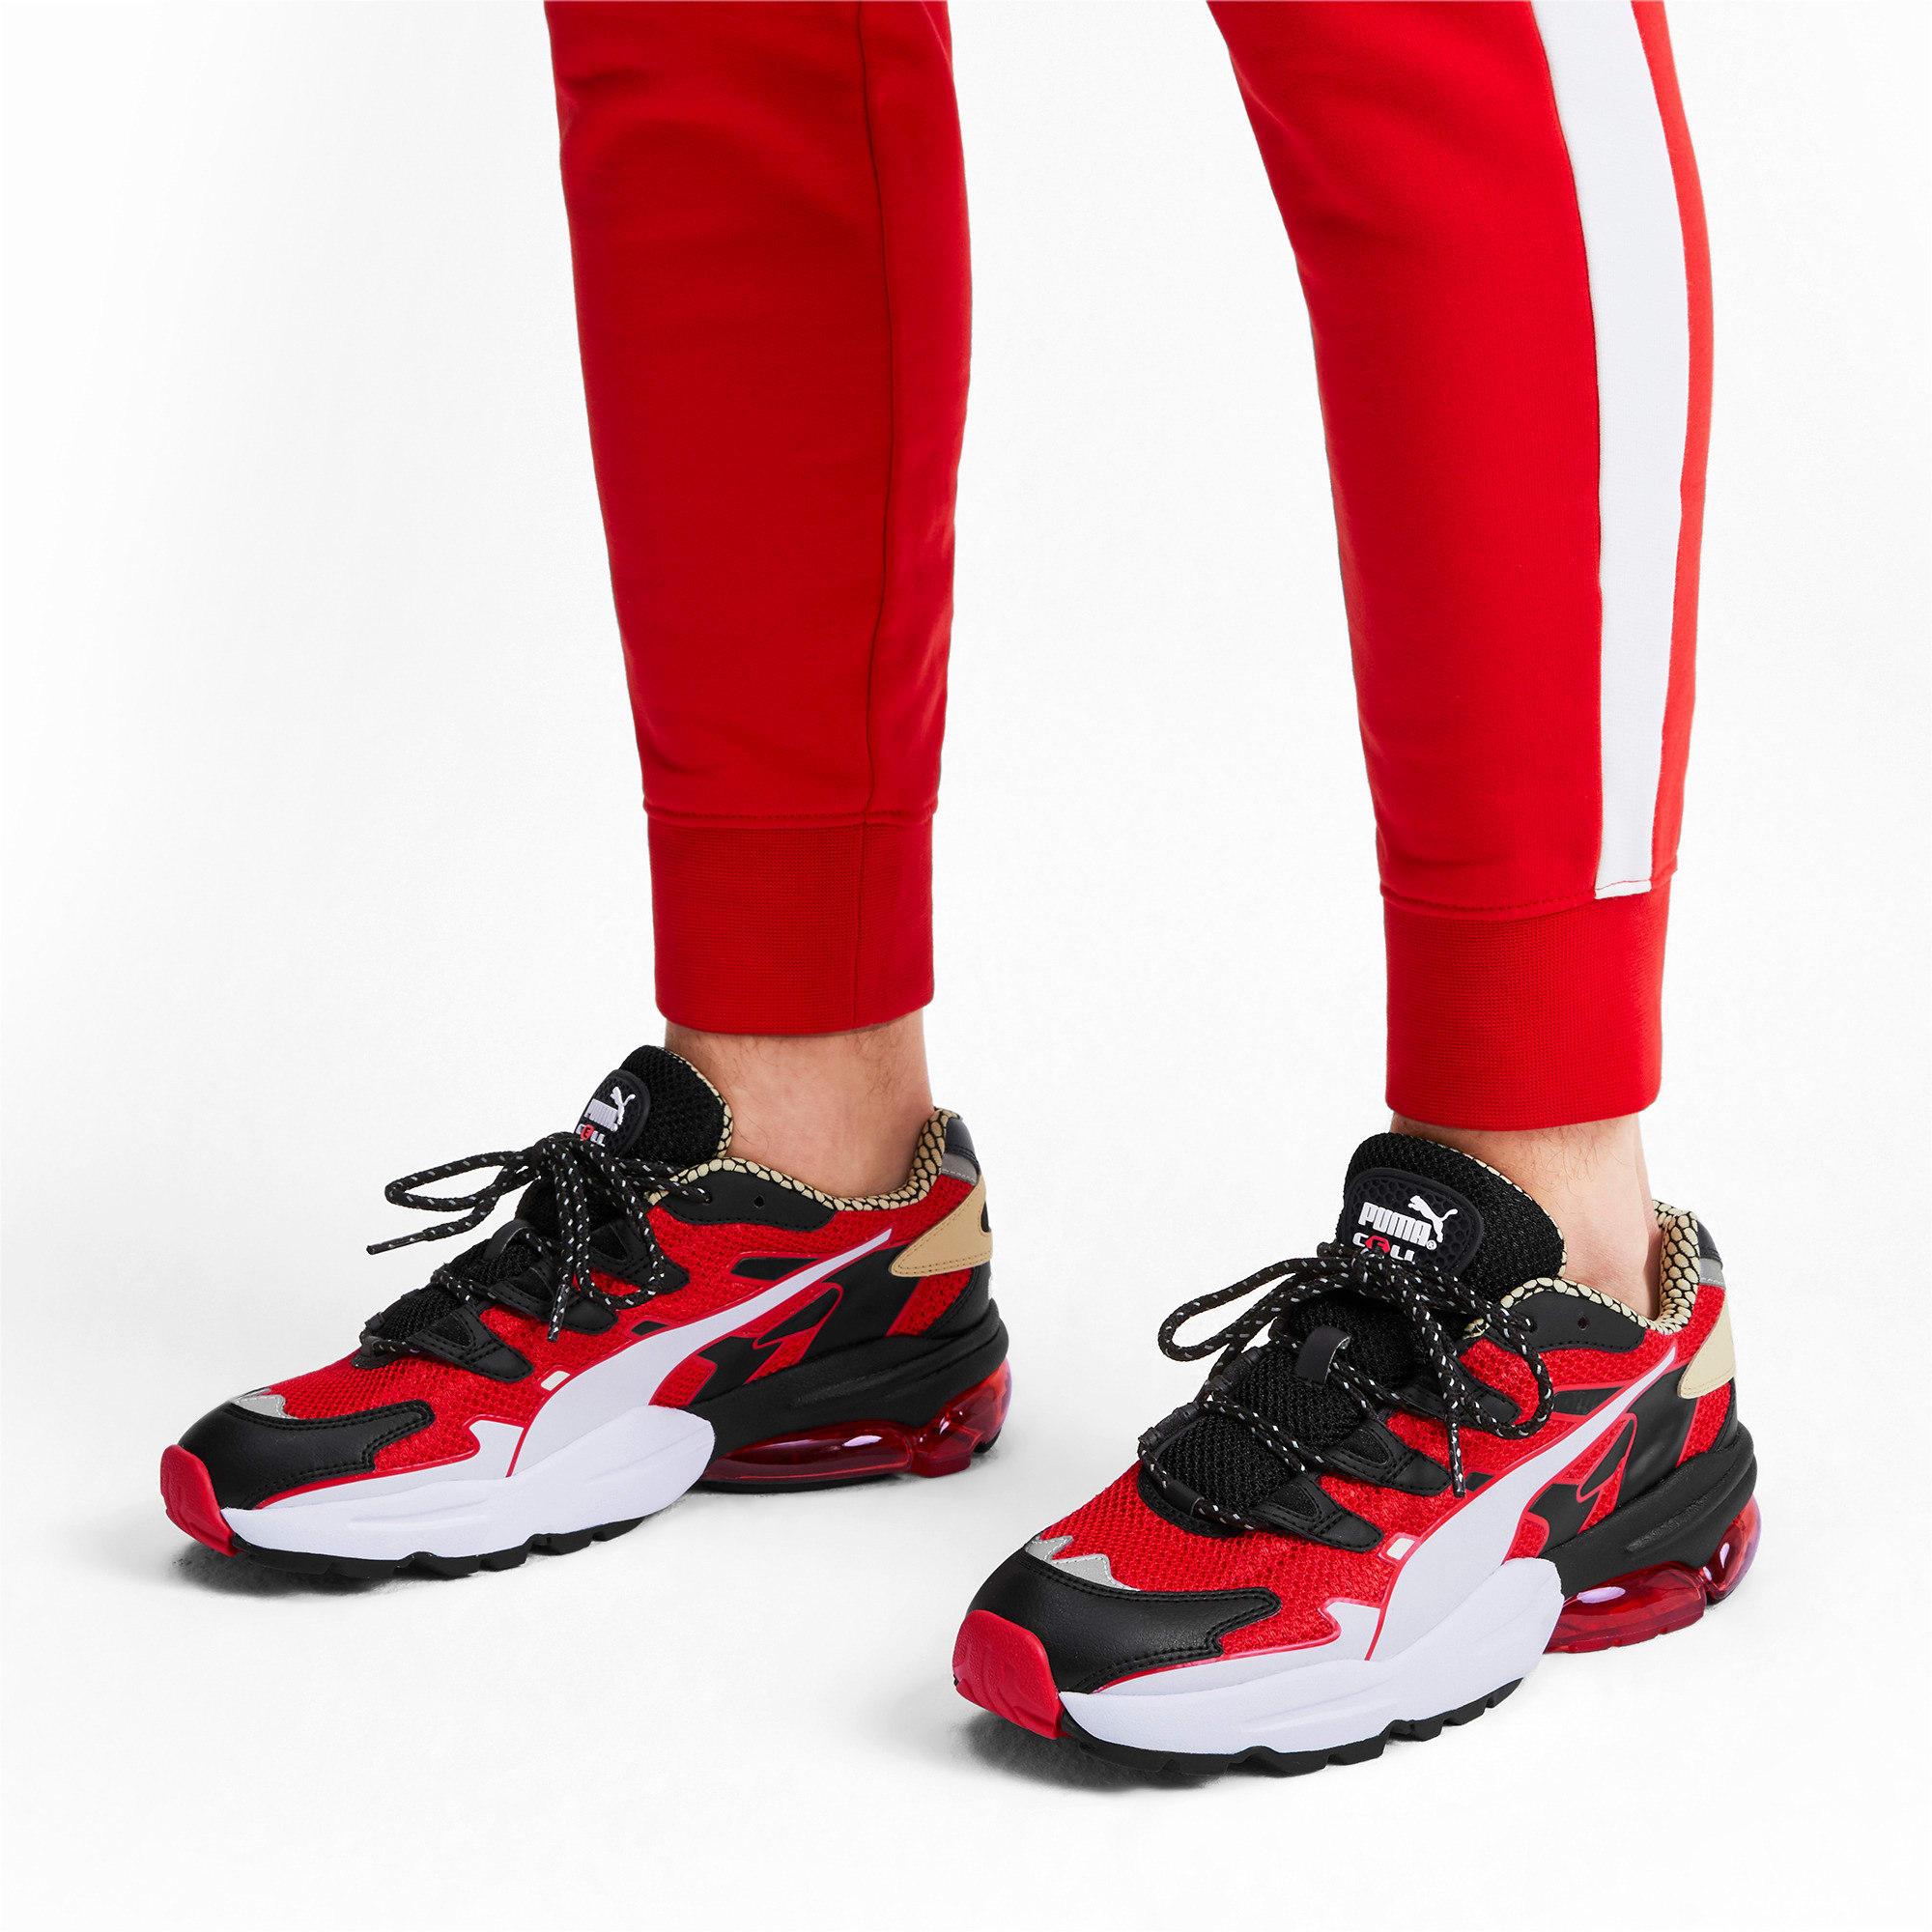 Thumbnail 2 of CELL Alien Kotto sportschoenen, High Risk Red-Puma Black, medium